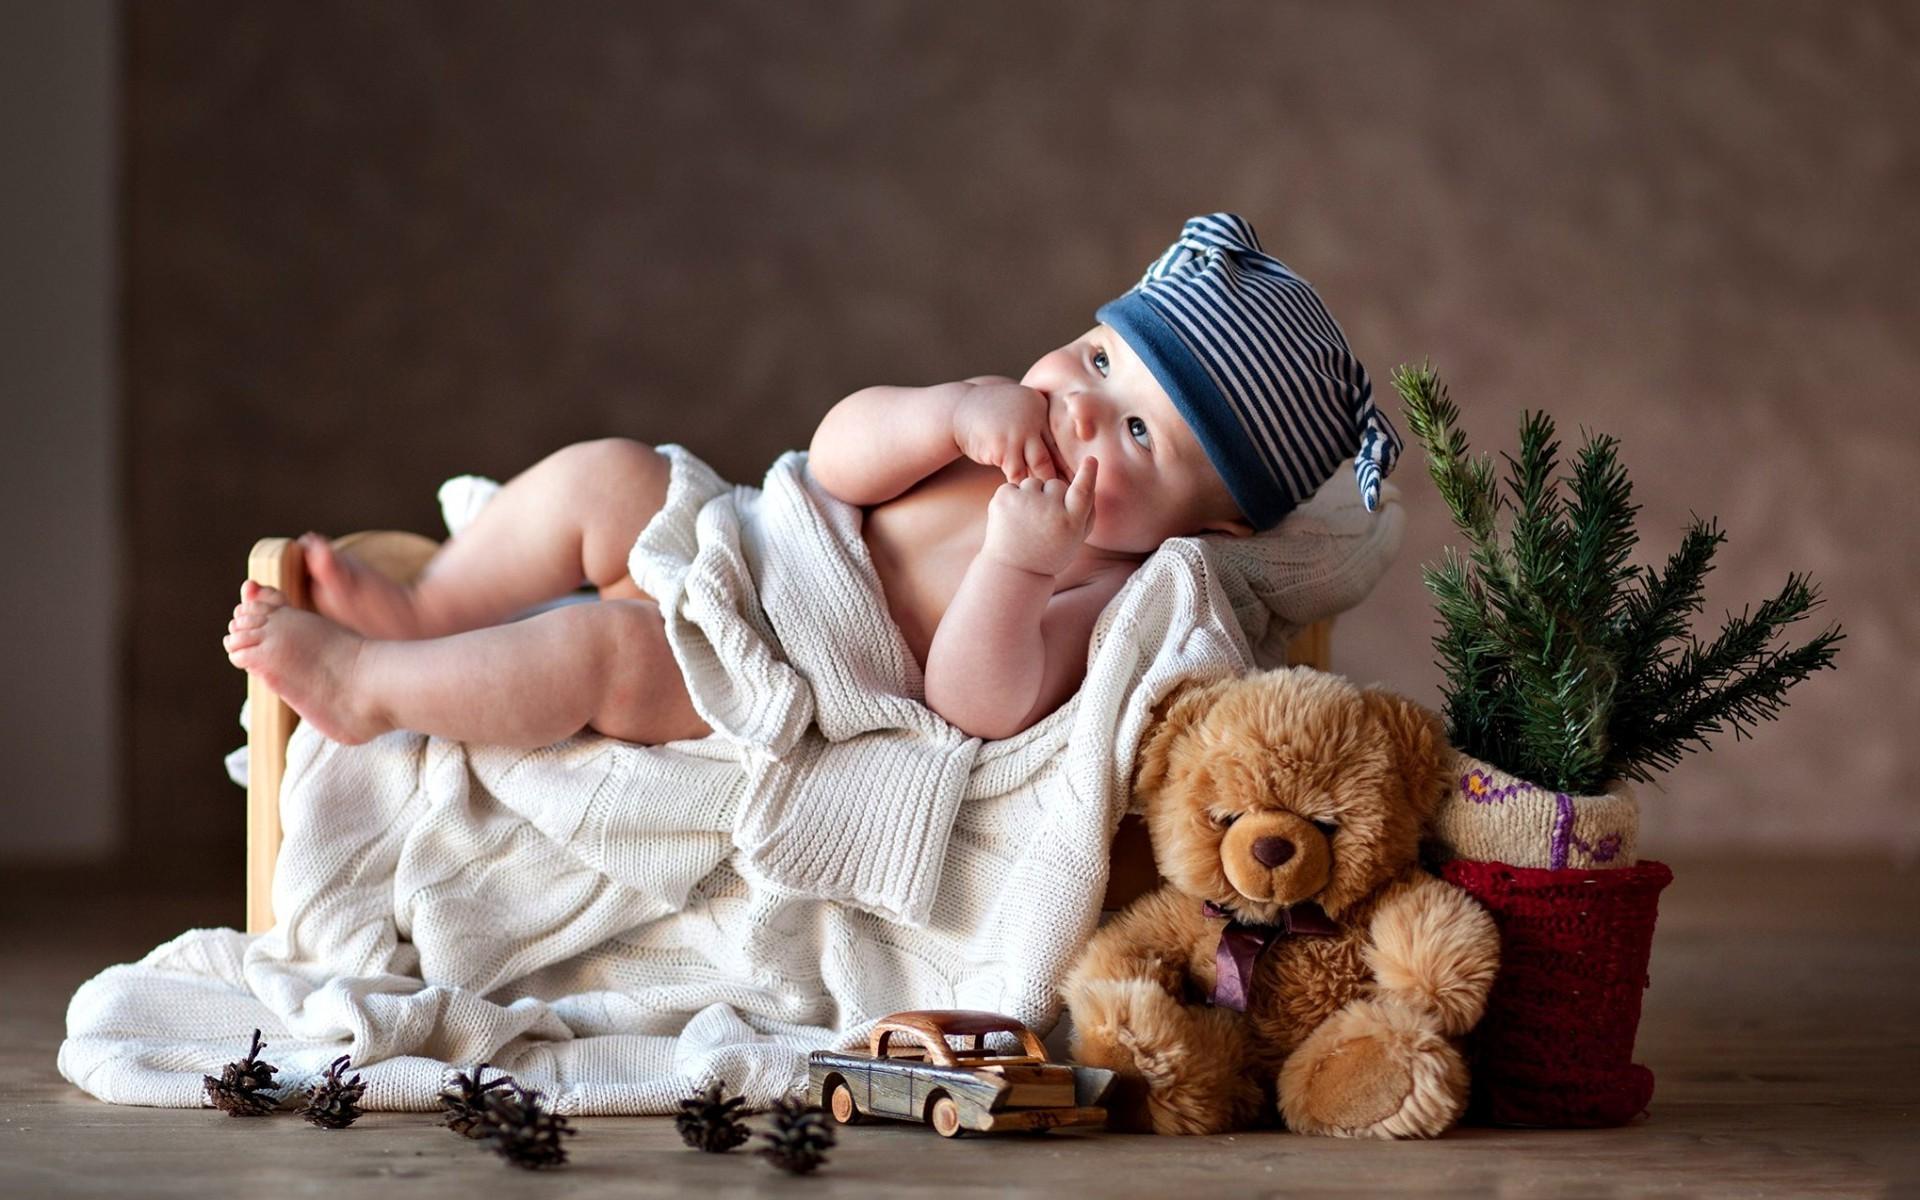 Младенец игрушки картинки